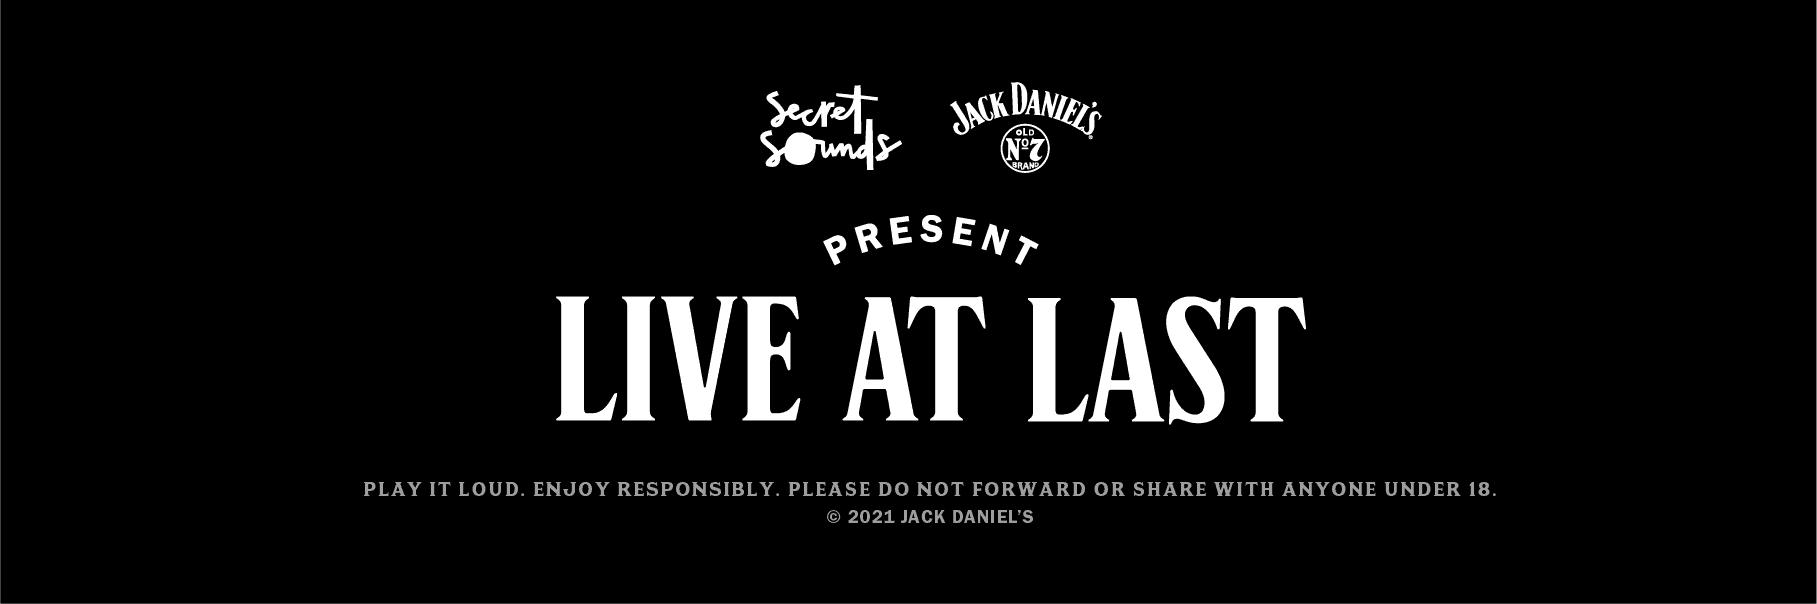 Scene News: Jack Daniel's LIVE AT LAST - Brisbane show announced. Presented by Secret Sounds.